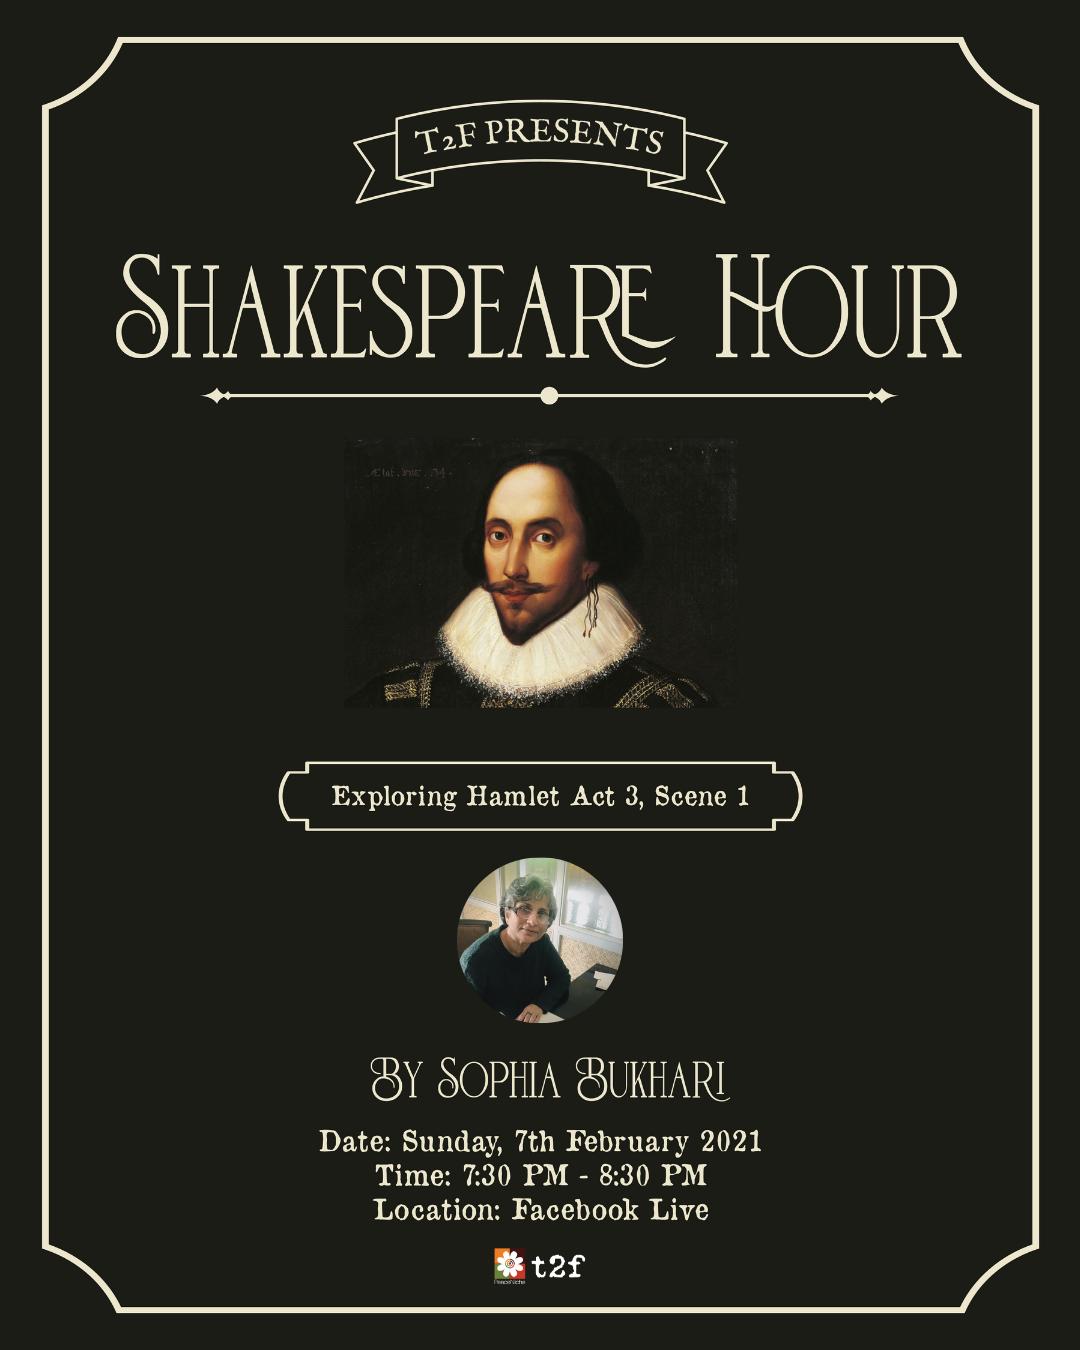 Shakespeare Hour